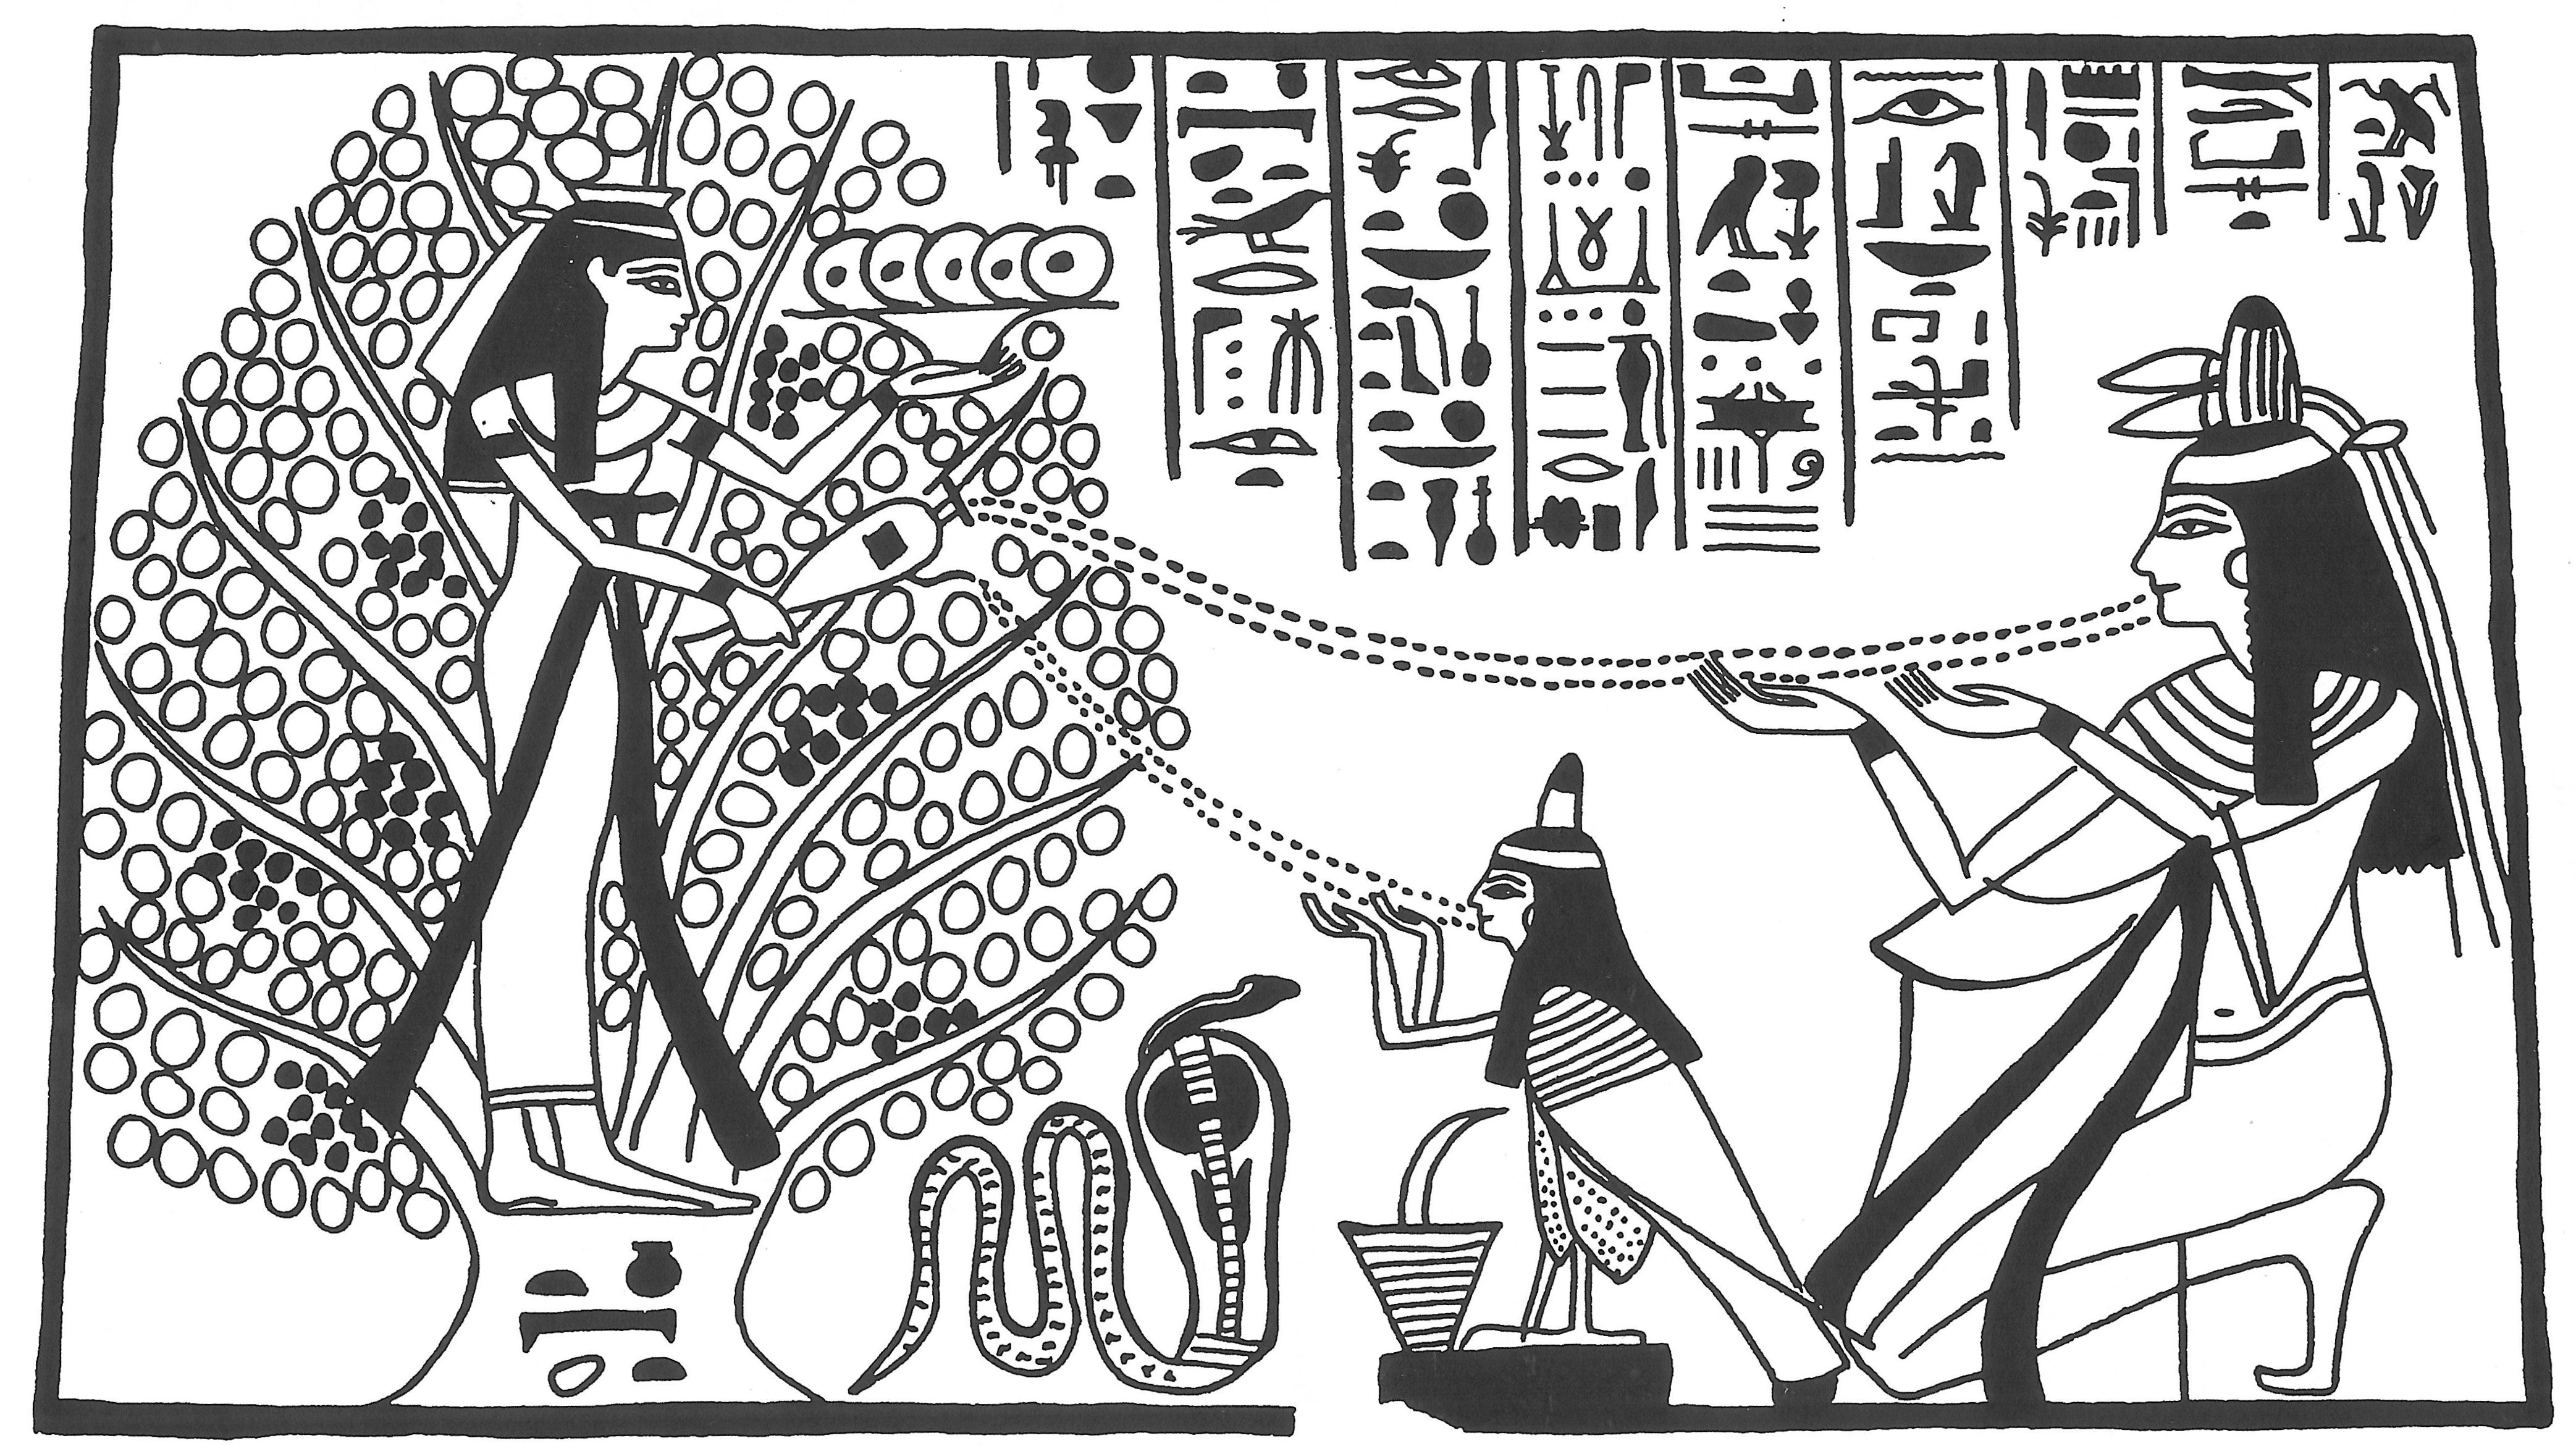 Yahwehs Divorce From The Goddess Asherah In The Garden Of Eden